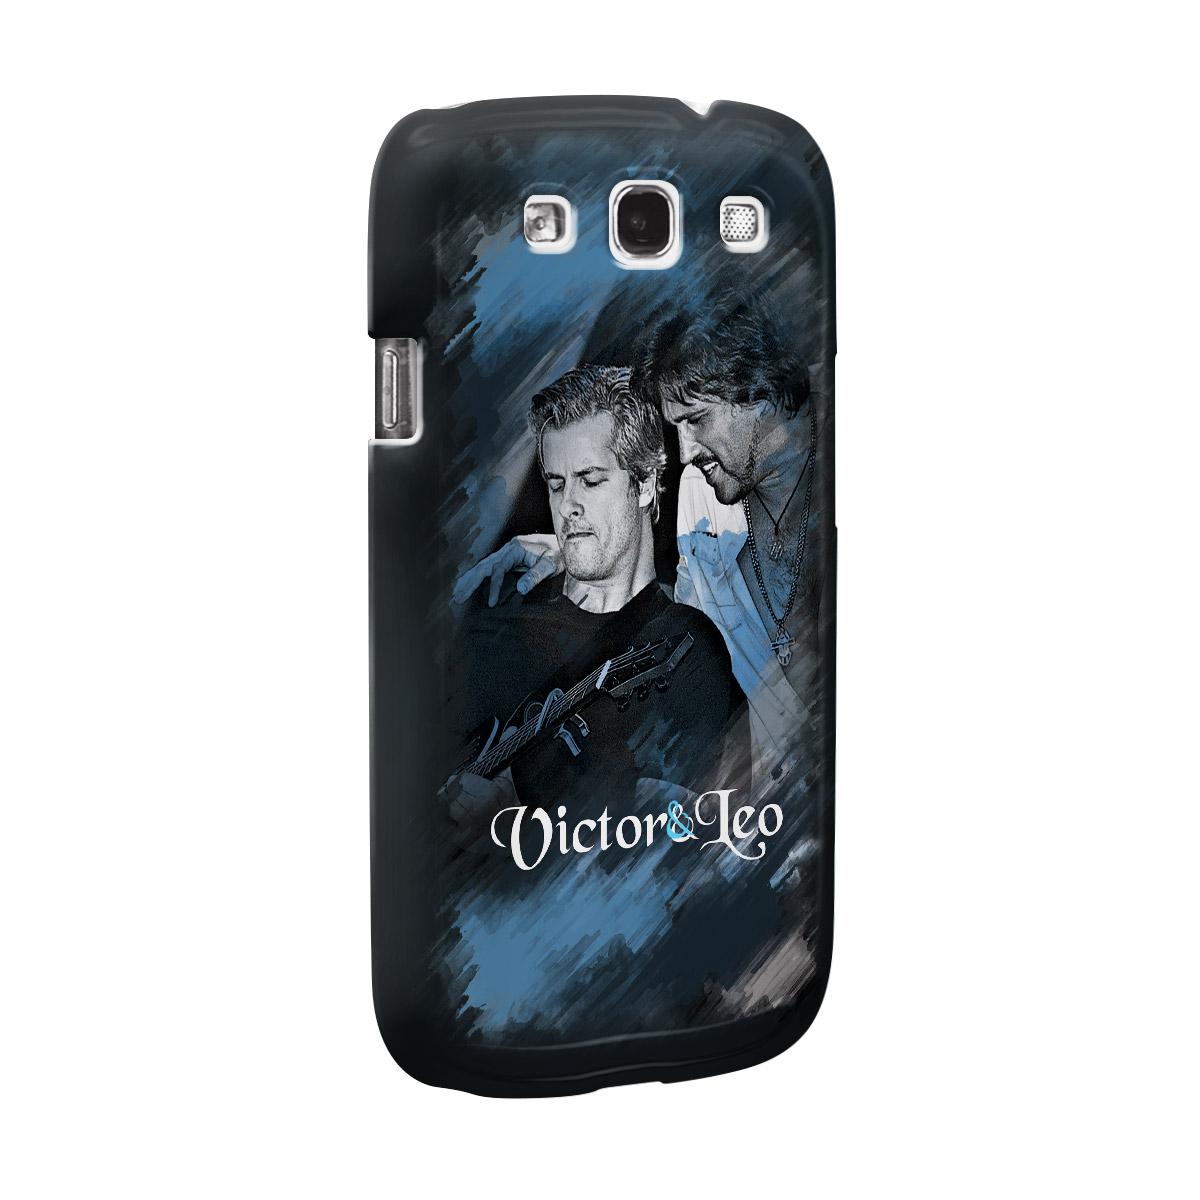 Capa para Samsung Galaxy S3 Victor & Leo Perfil